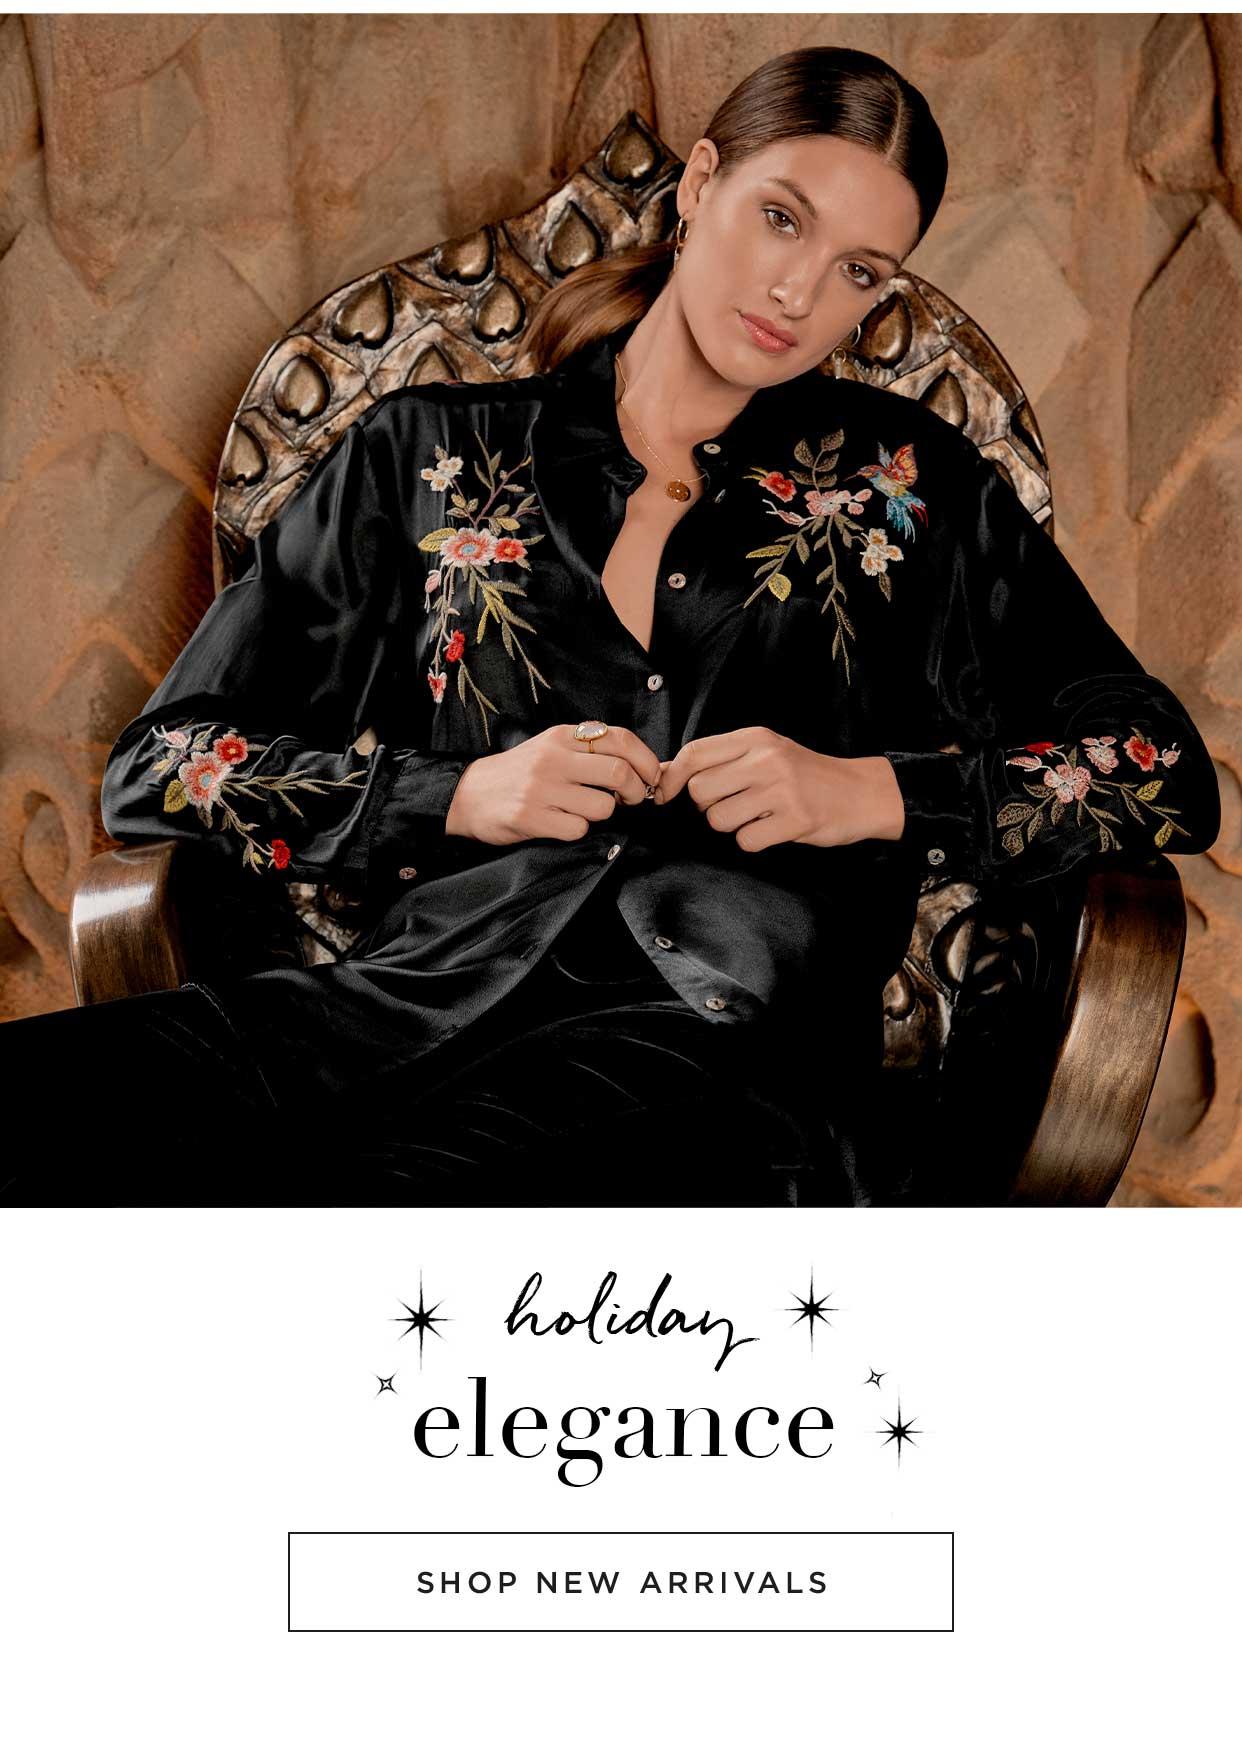 Holiday Elegance - Shop New Arrivals